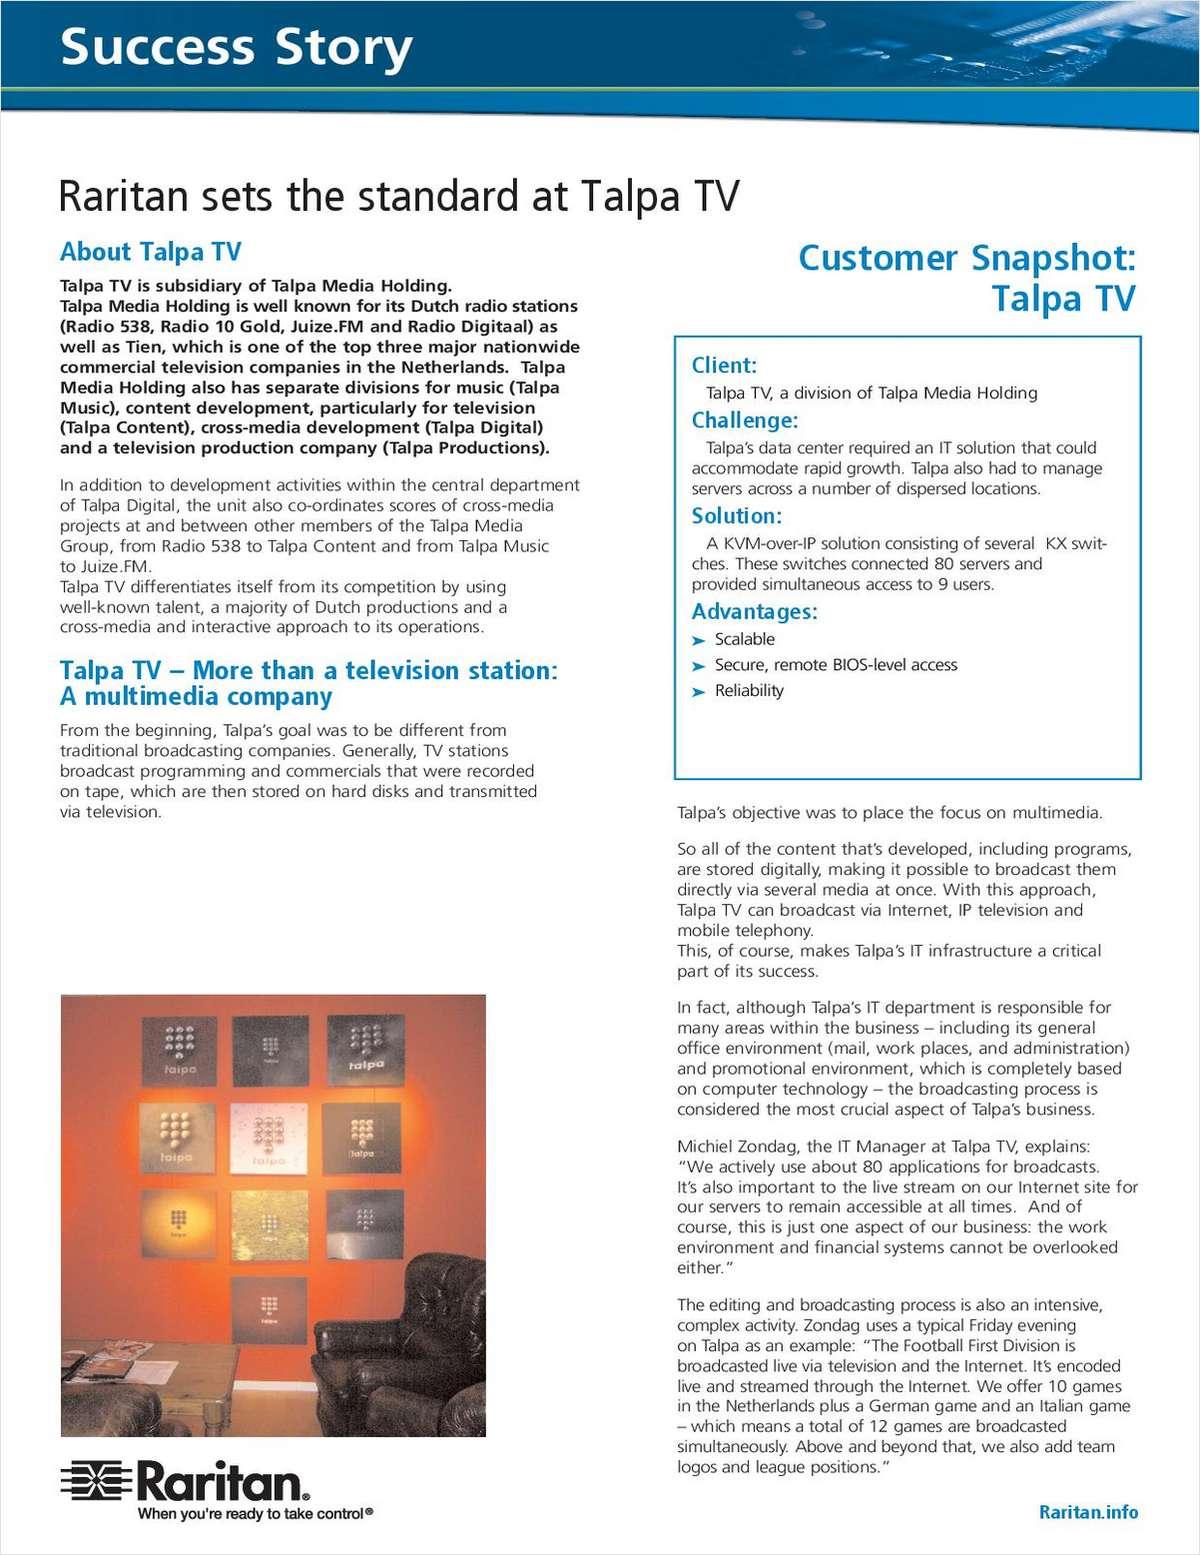 Raritan Sets the Standard at Talpa TV